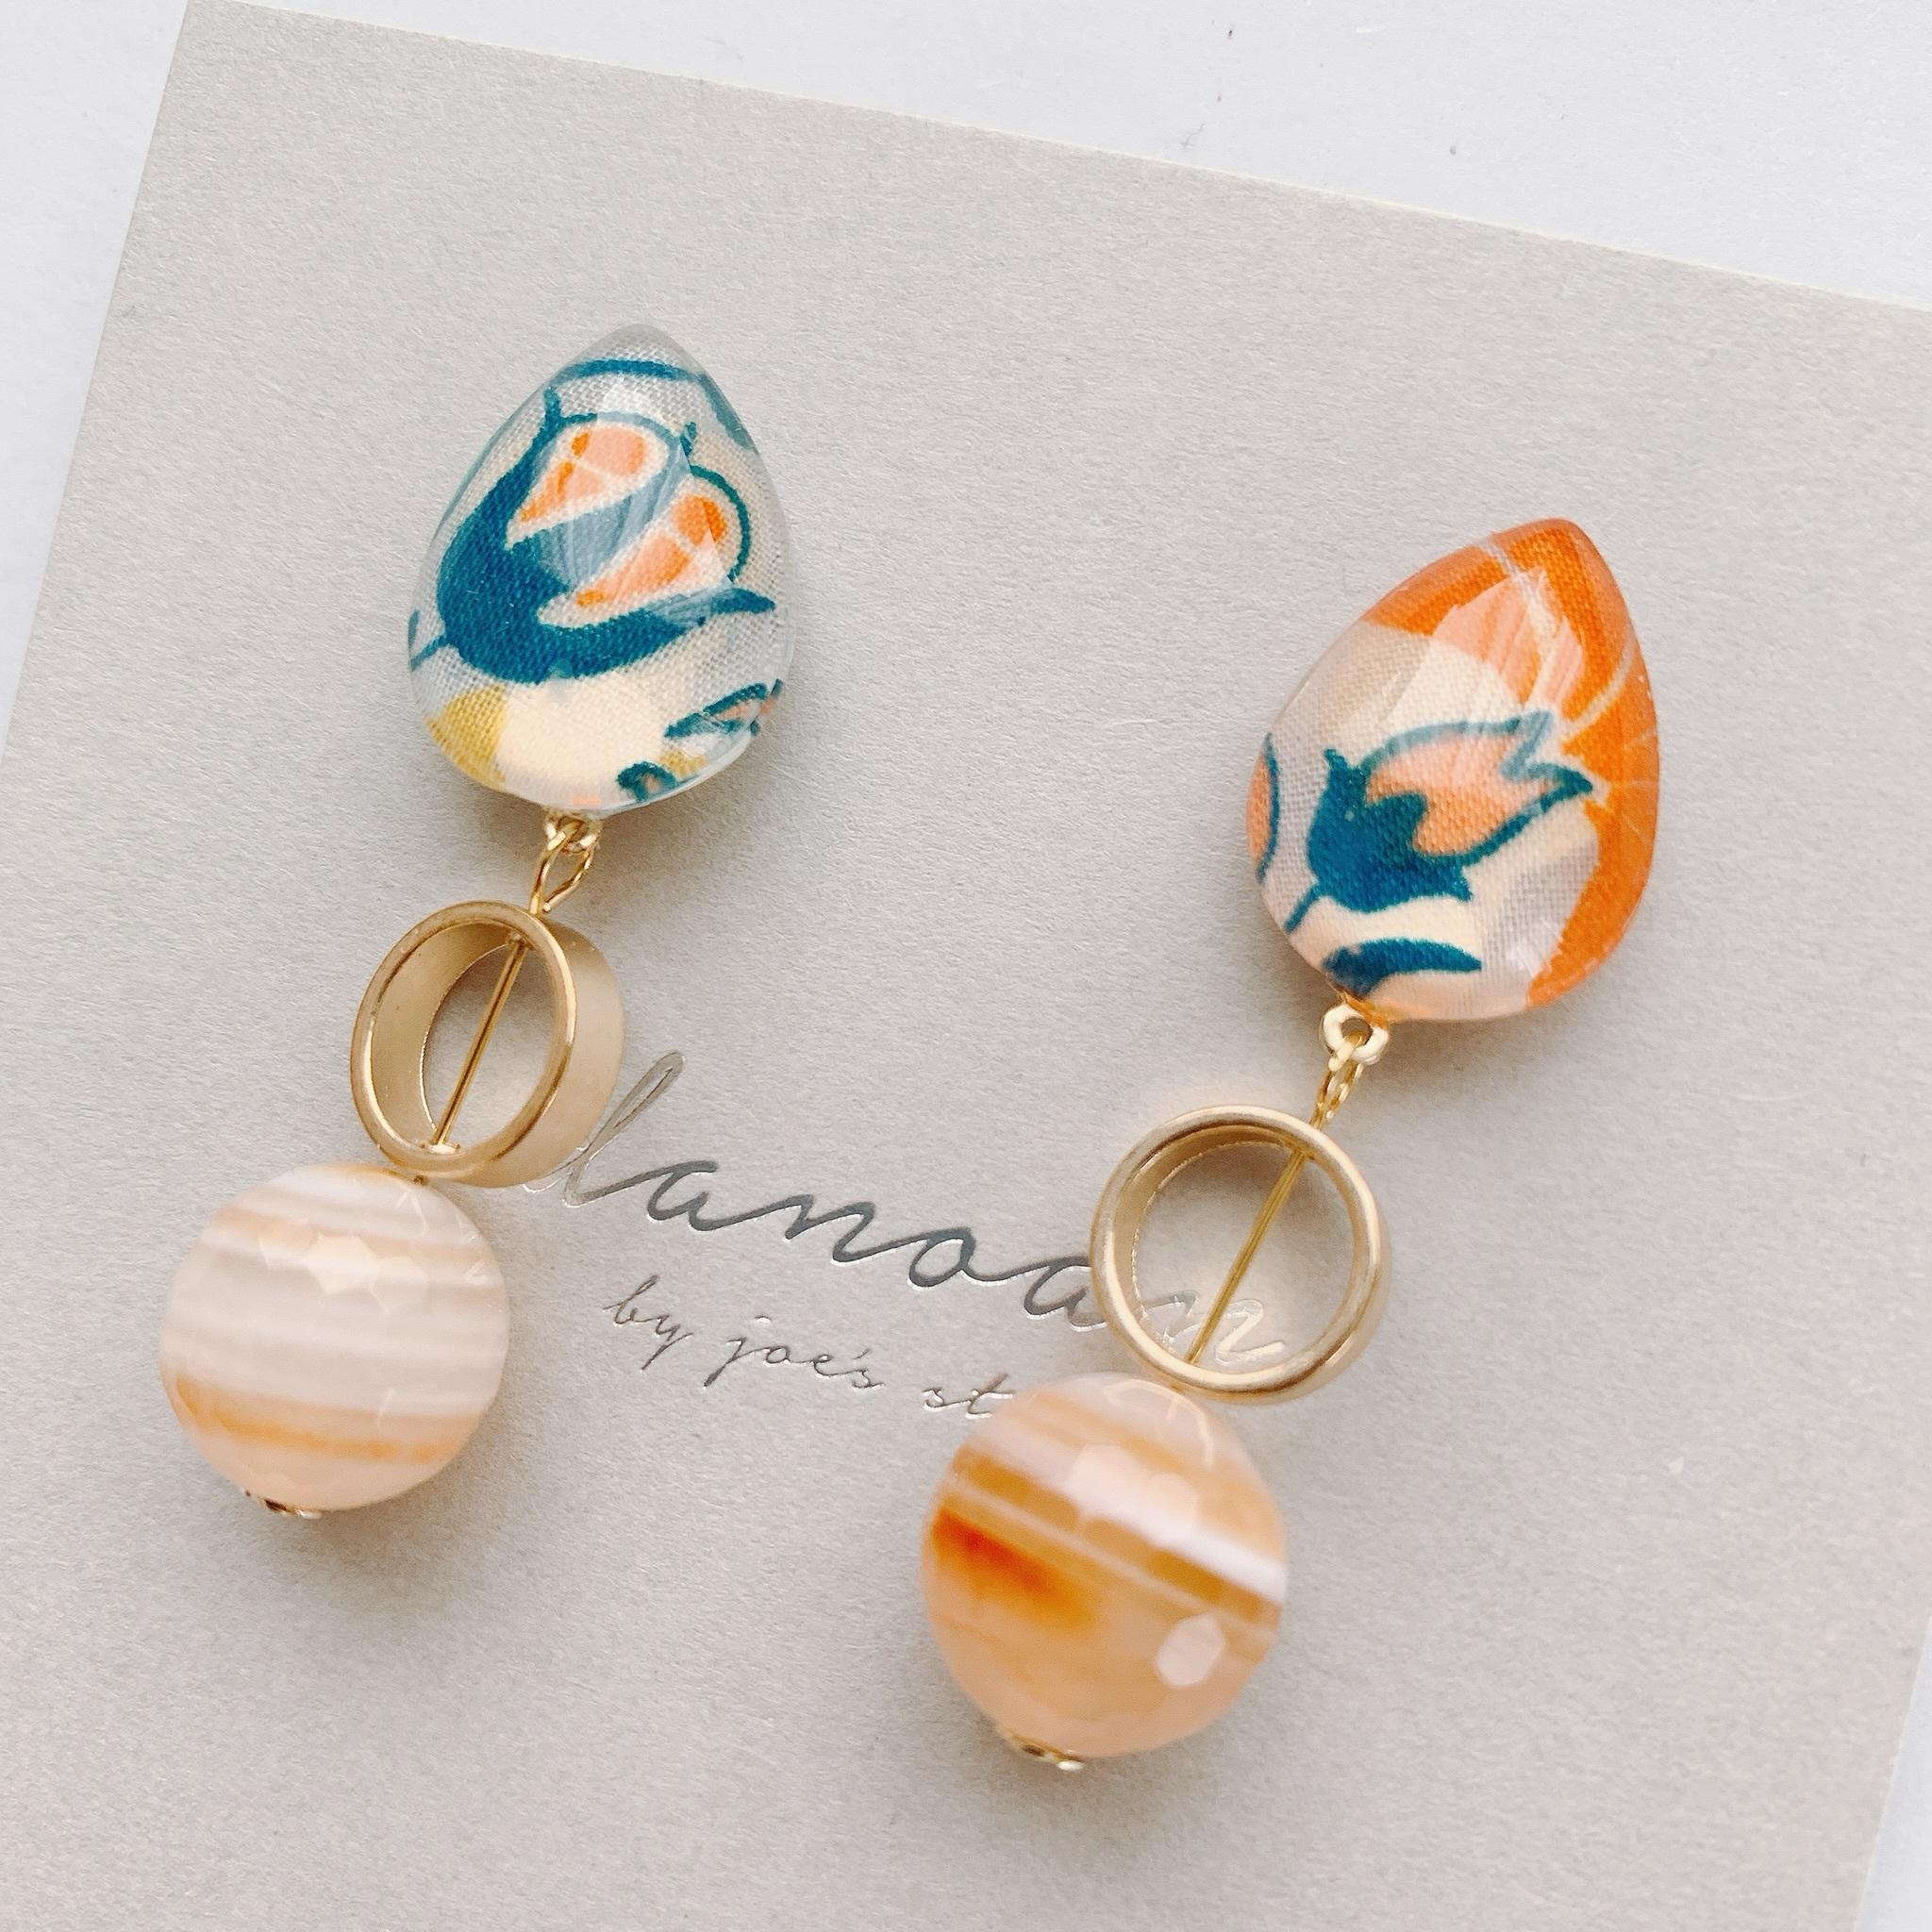 """ Earrings NO.danoan-1-1849″ リバティと天然石"